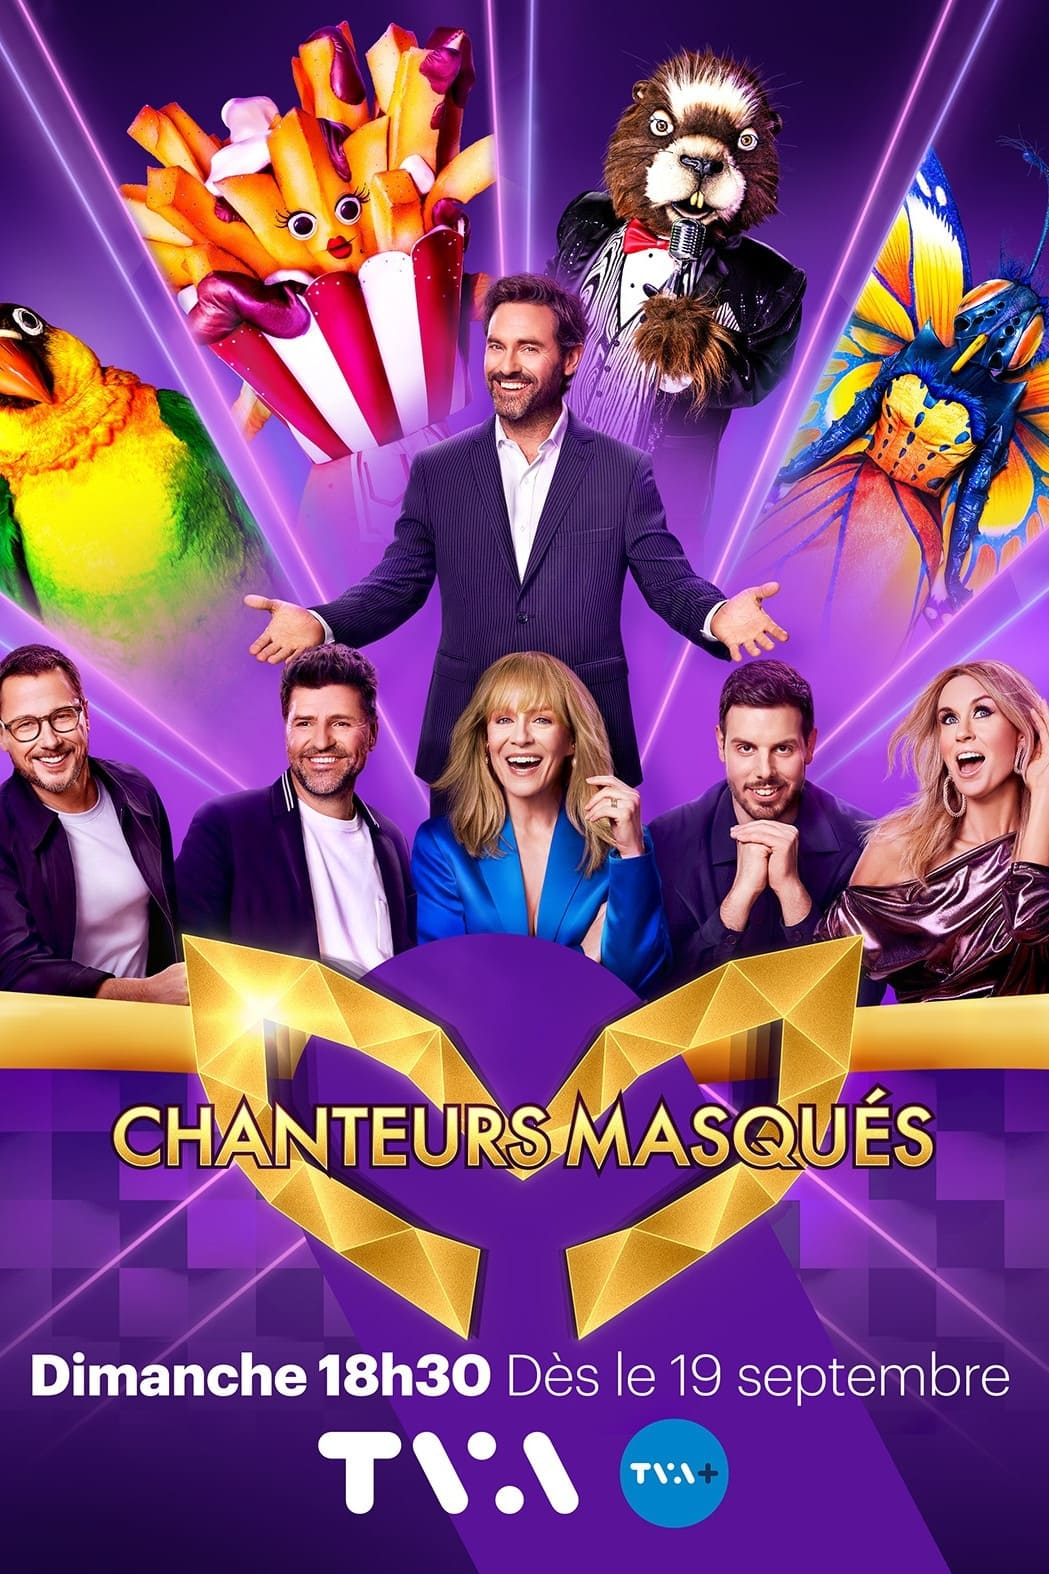 Chanteurs masqués TV Shows About Hidden Identity